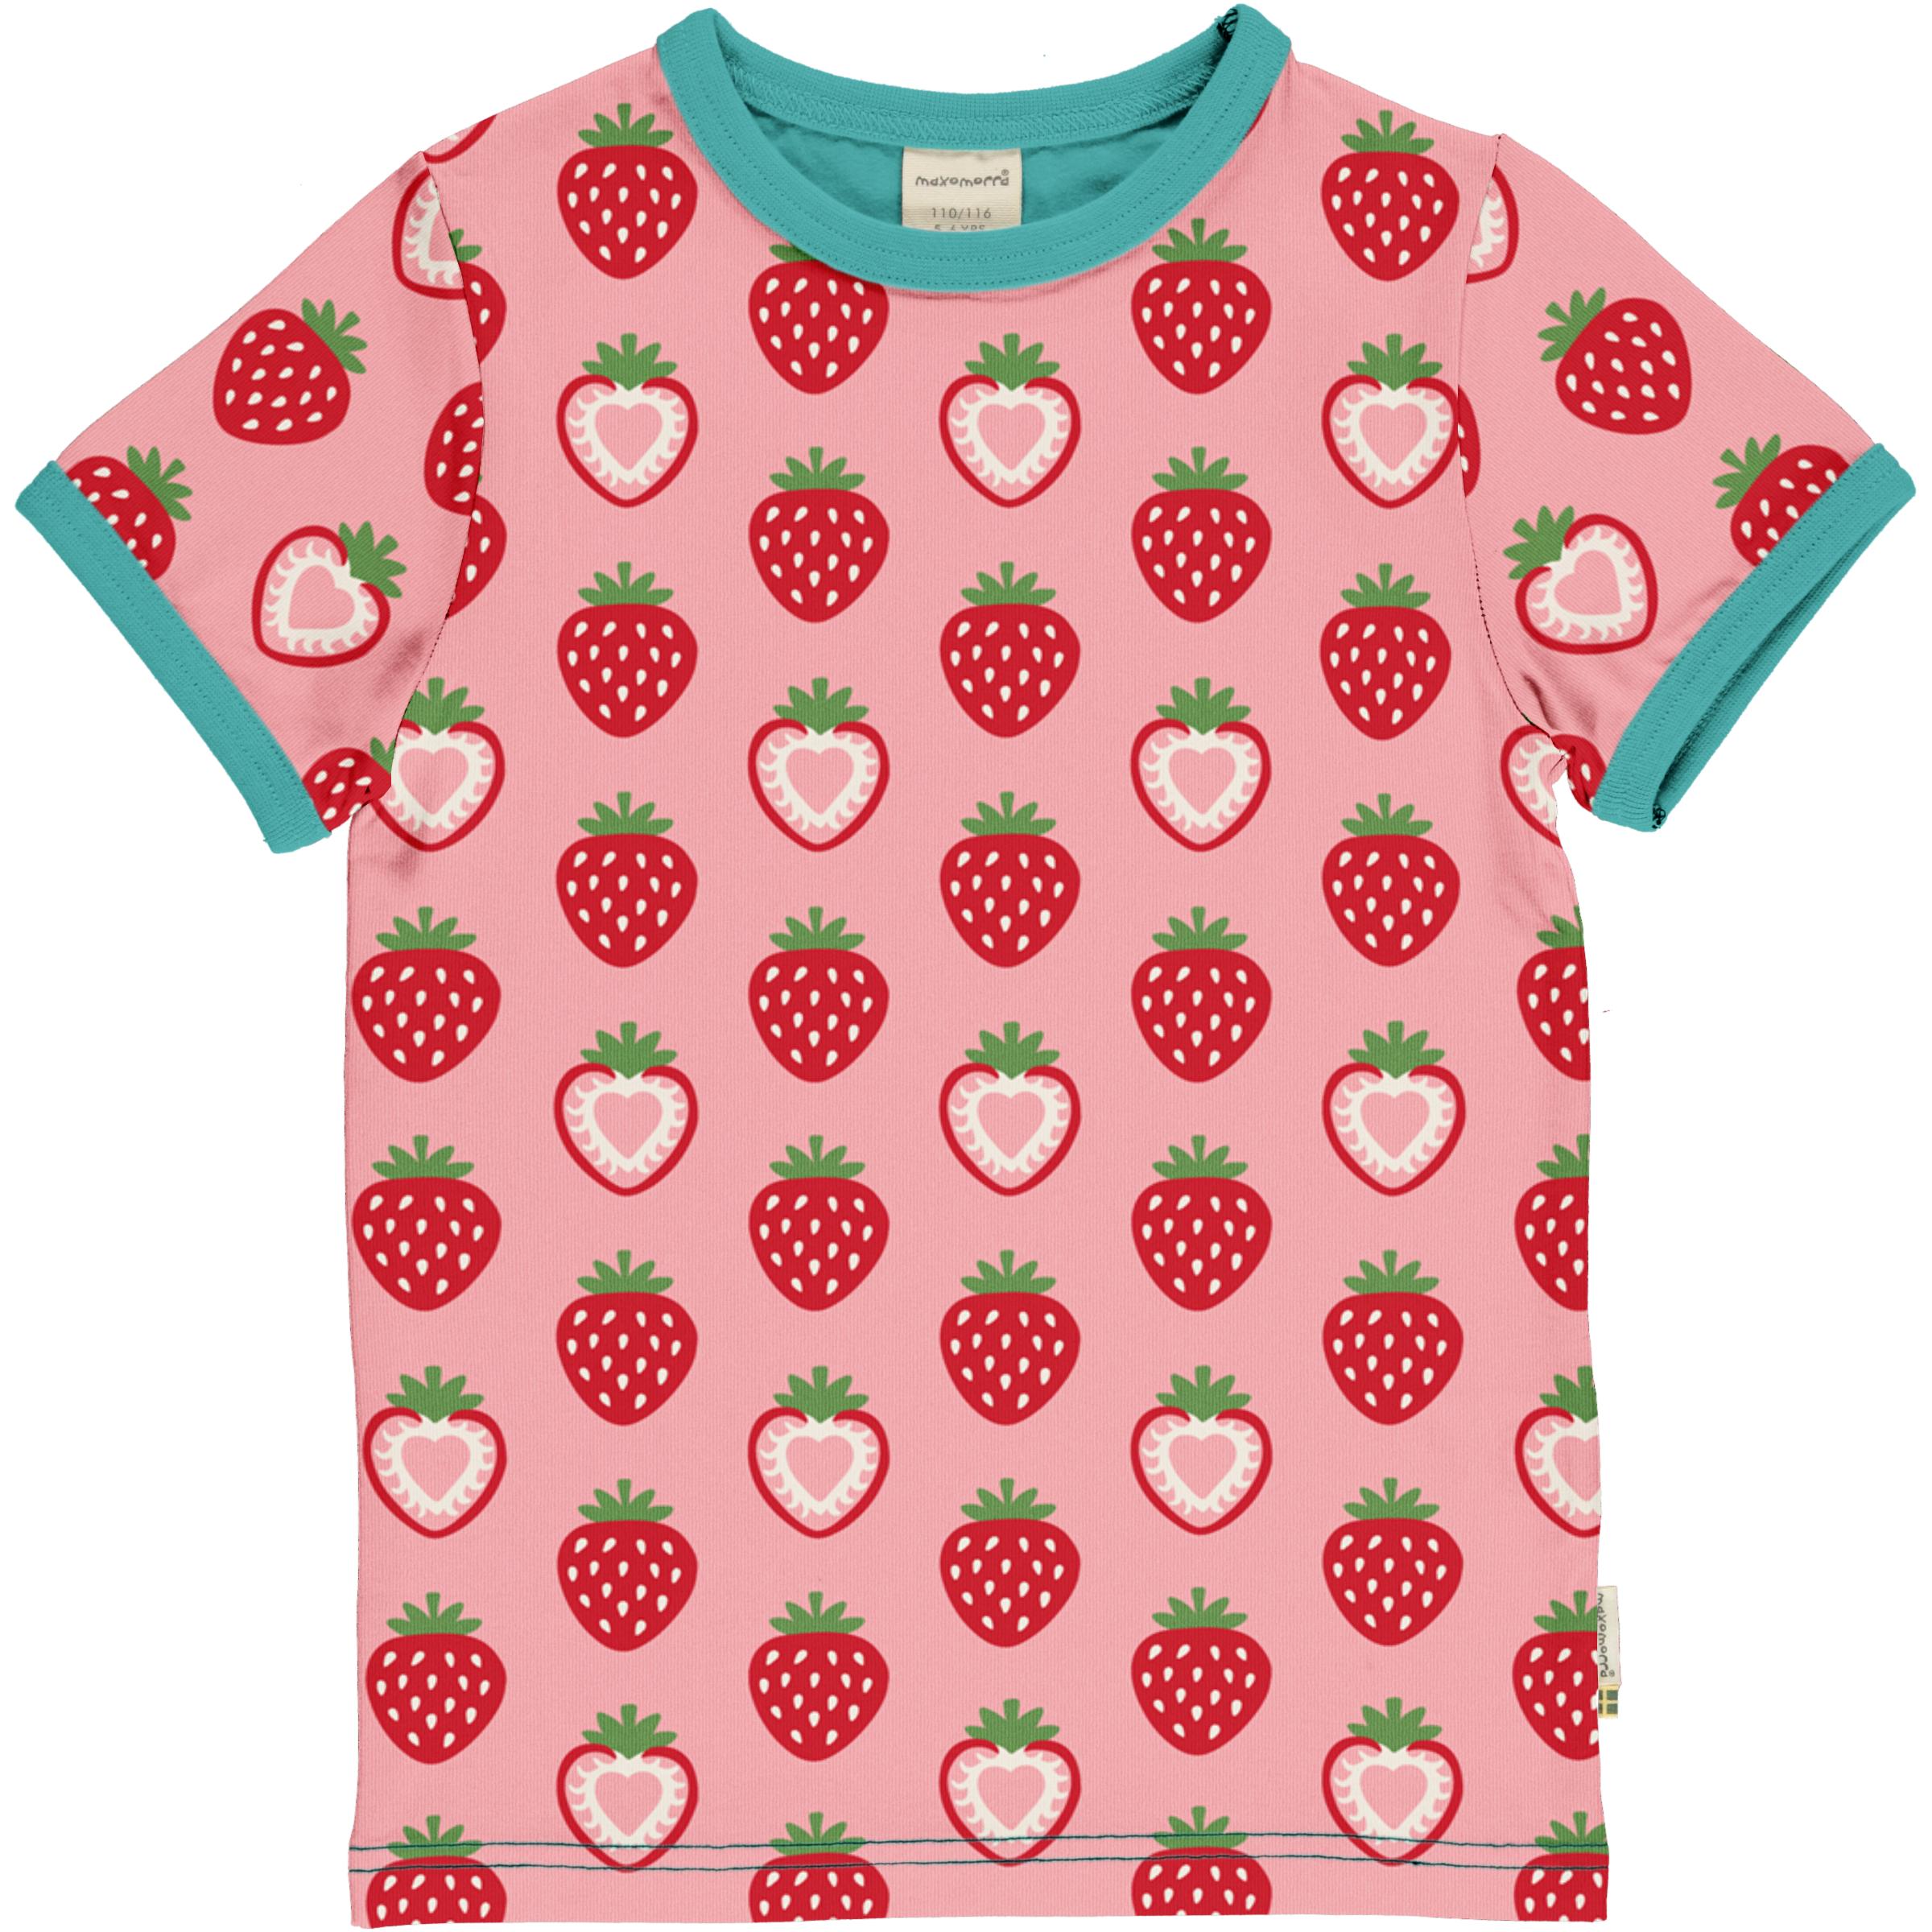 Maxomorra T-Shirt STRAWBERRY 086/092